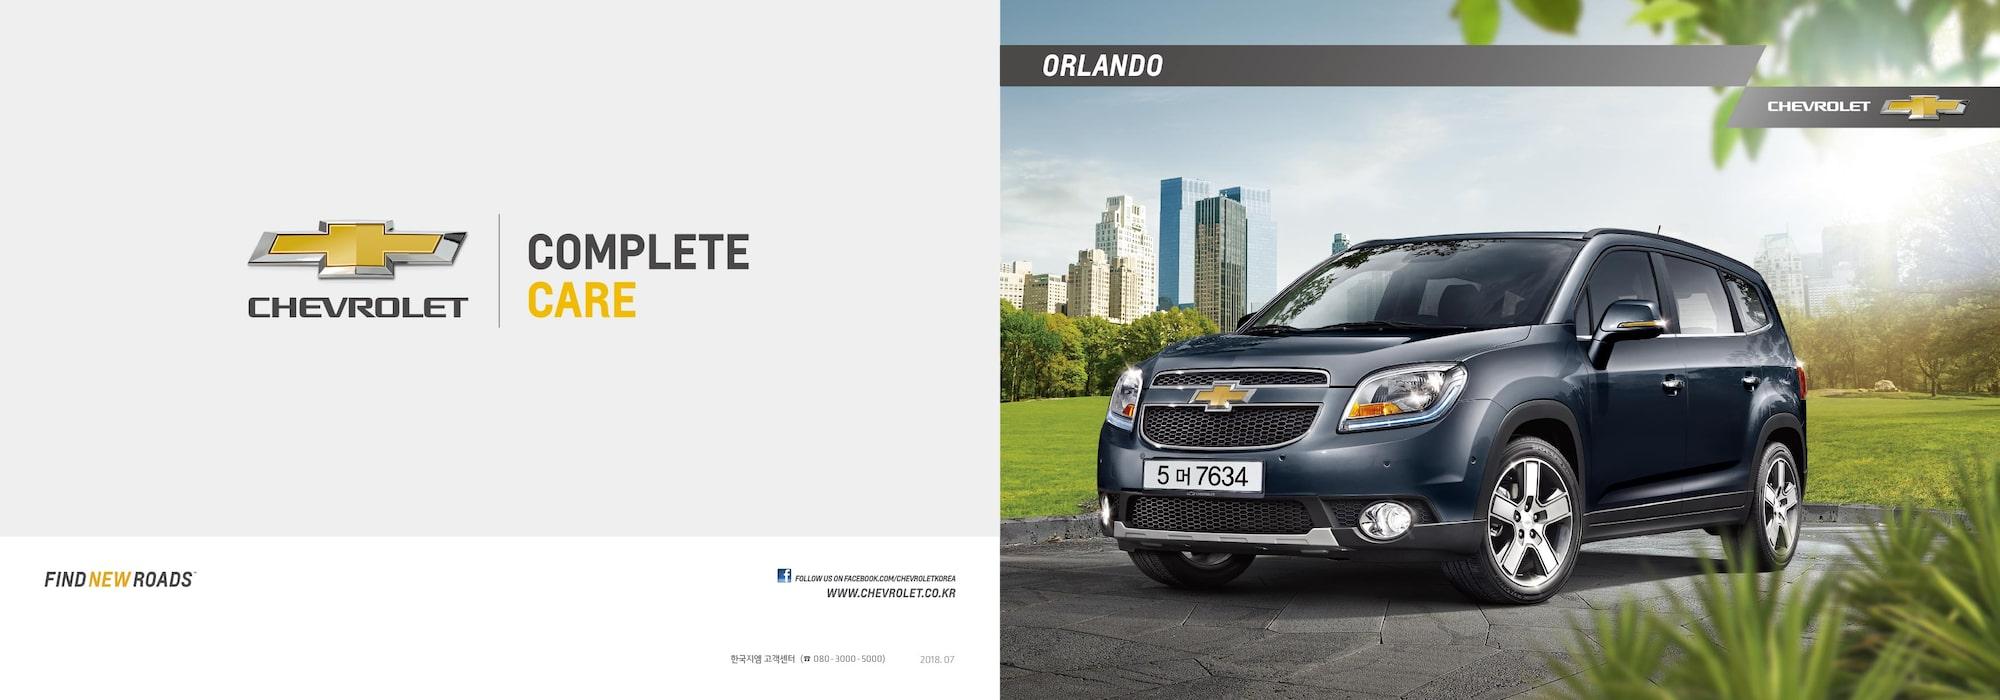 Nova Spin 2017 likewise Steuerzeiten Werkzeug Fuer Opel 1 6 16V 1 8  937 furthermore Chevrolet Cruze 2017 Geracao Motor Turbo besides Foto in addition Foto. on chevrolet orlando